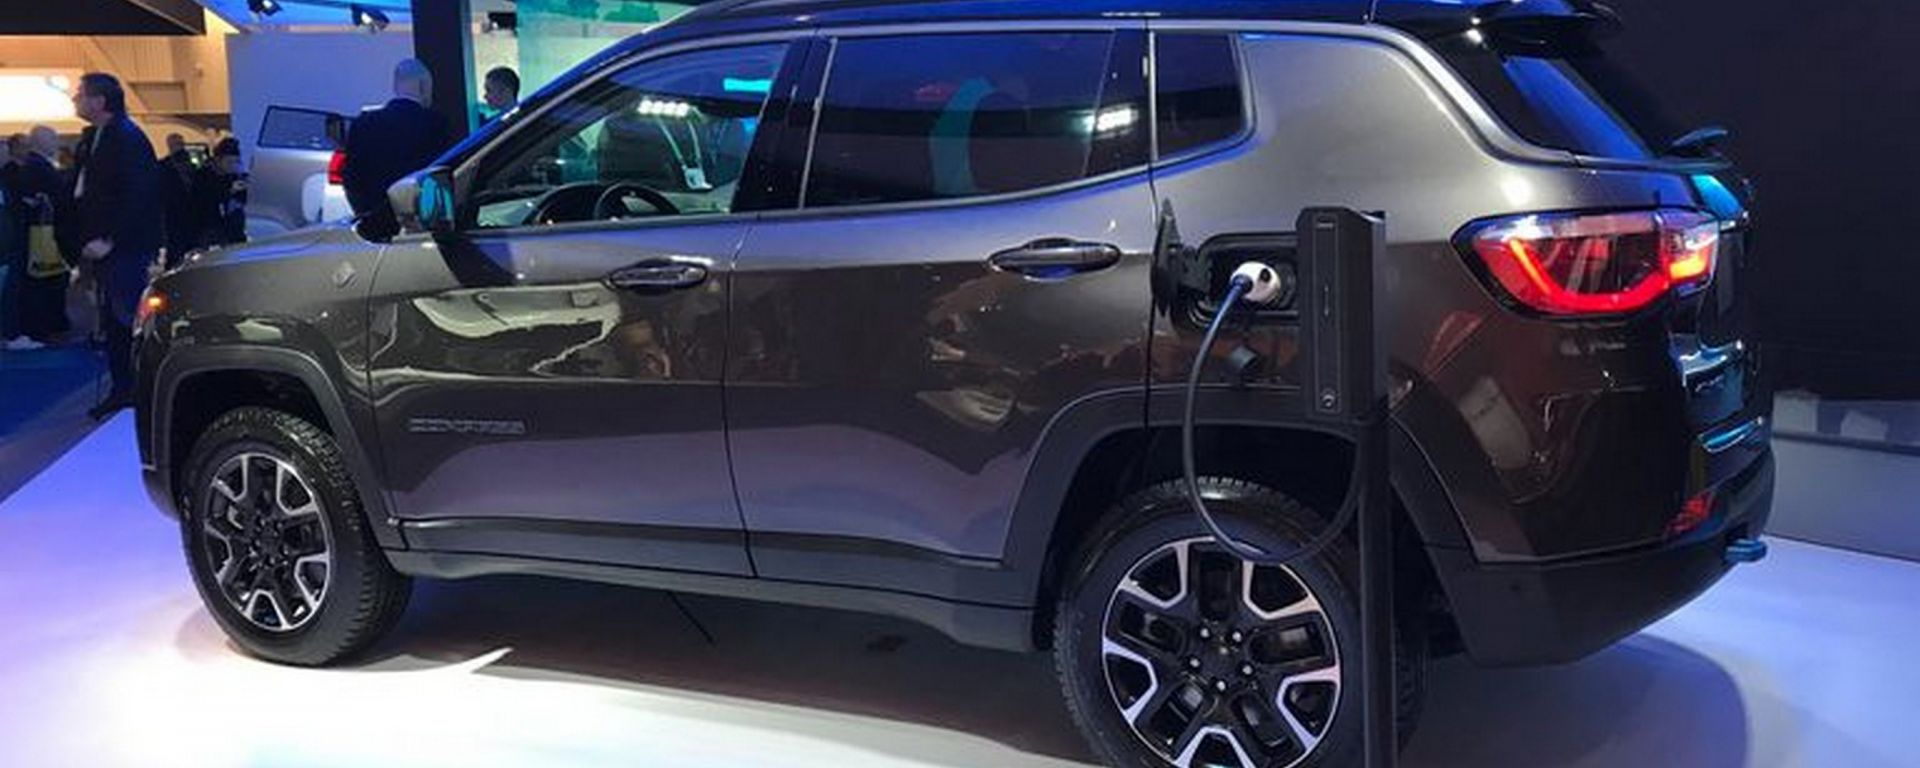 Jeep Compass ibrida plug-in, CES 2020